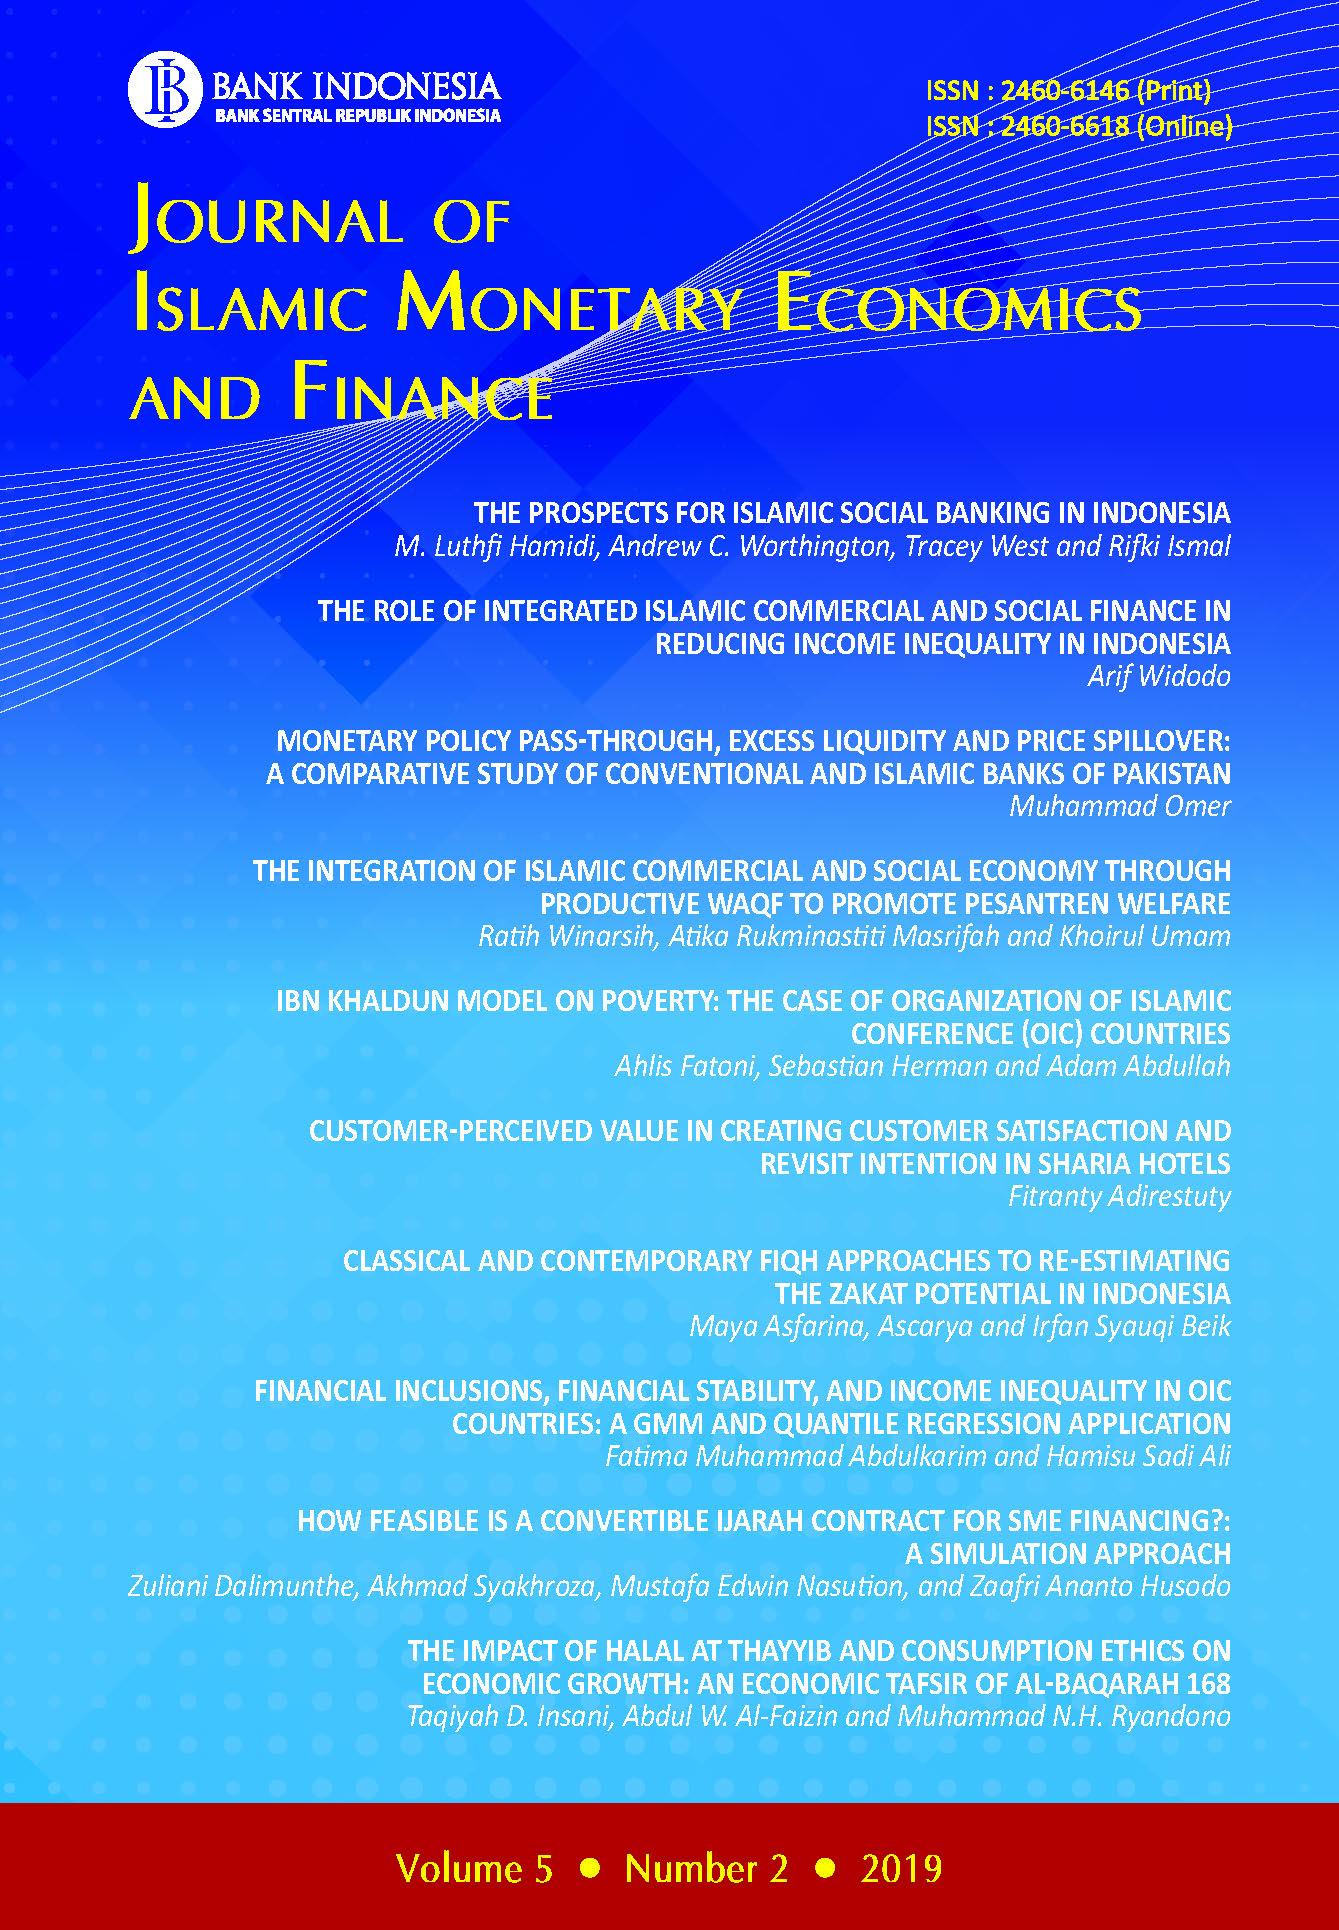 Journal of Islamic Monetary Economics and Finance